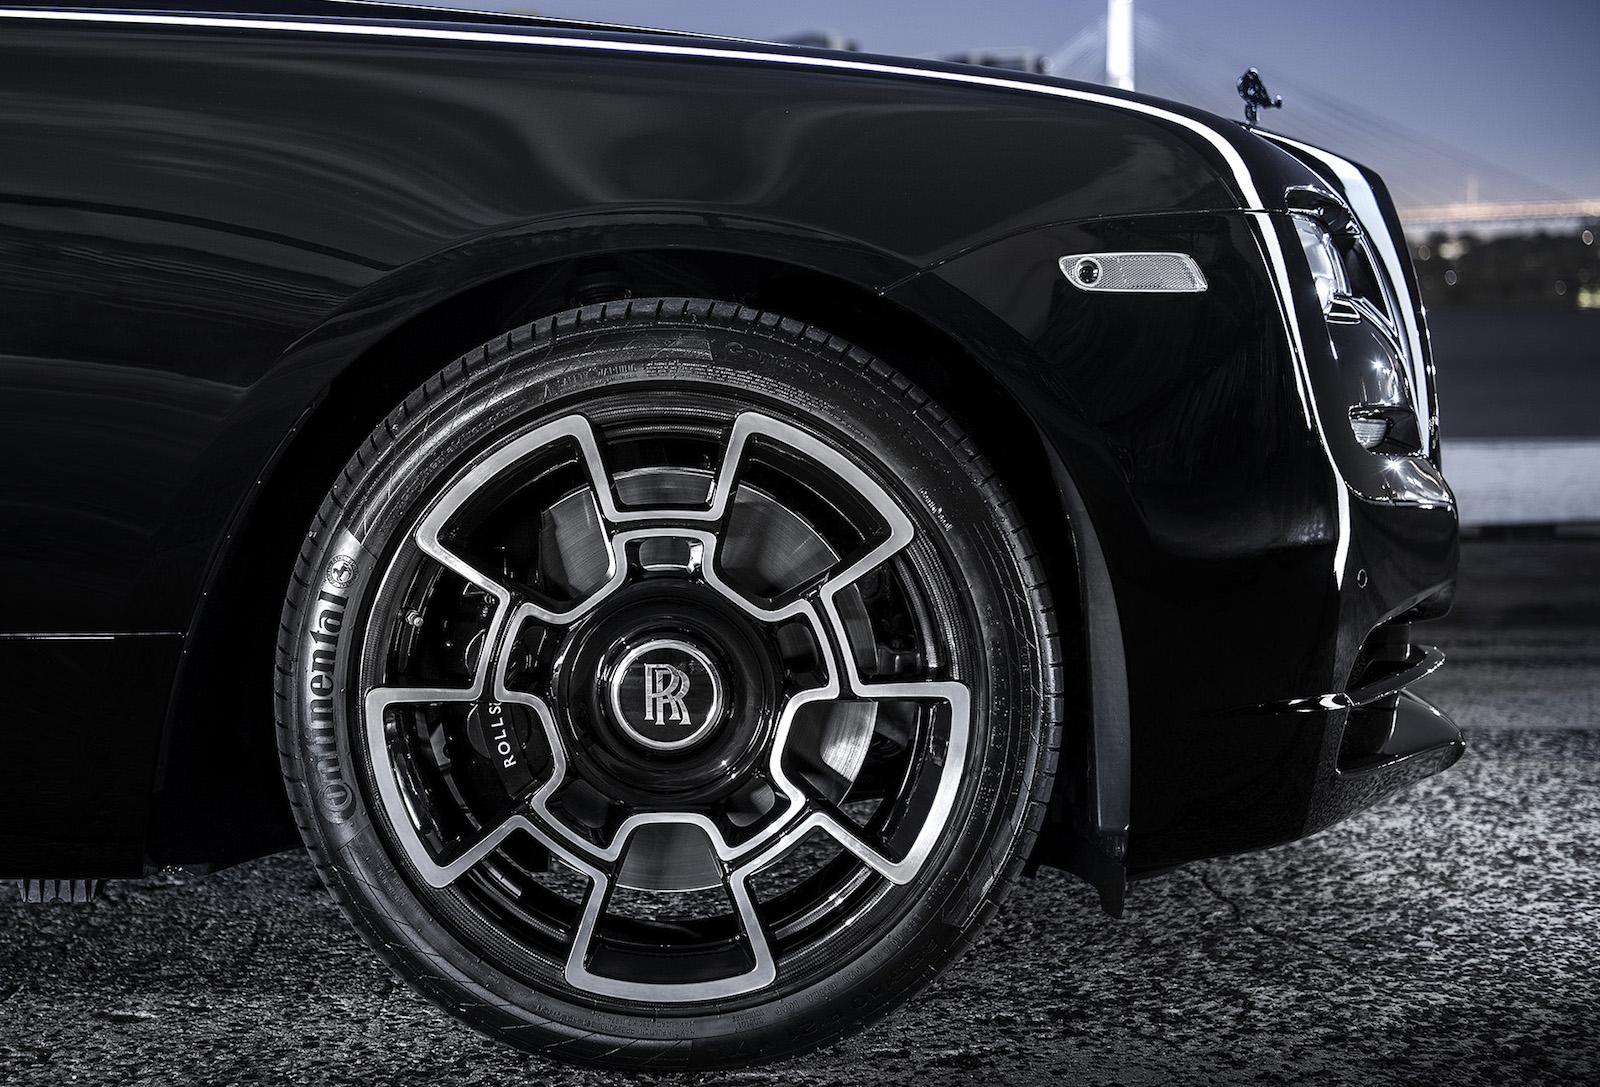 BMW Z4 For Sale >> Rolls-Royce Black Badge series lands in Australia ...